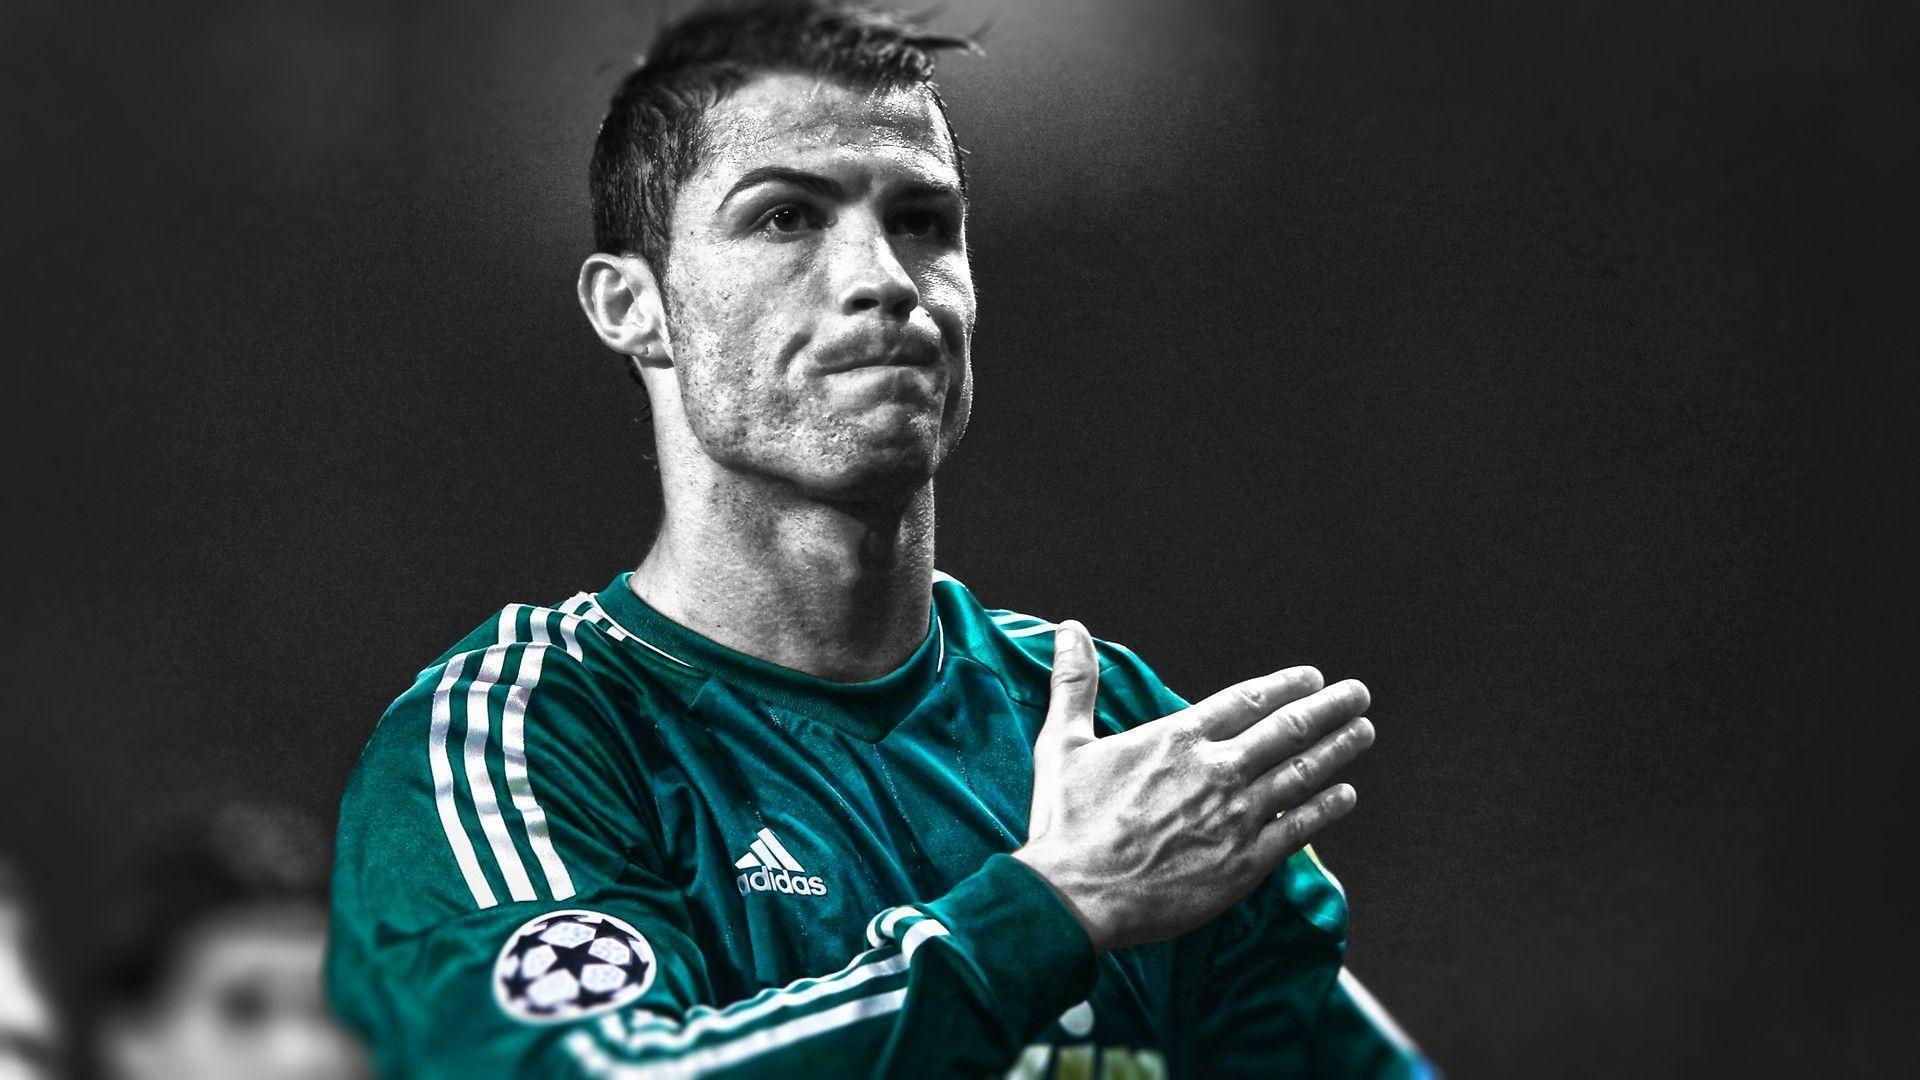 Cristiano Ronaldo HD Wallpapers 2015 Sporteology